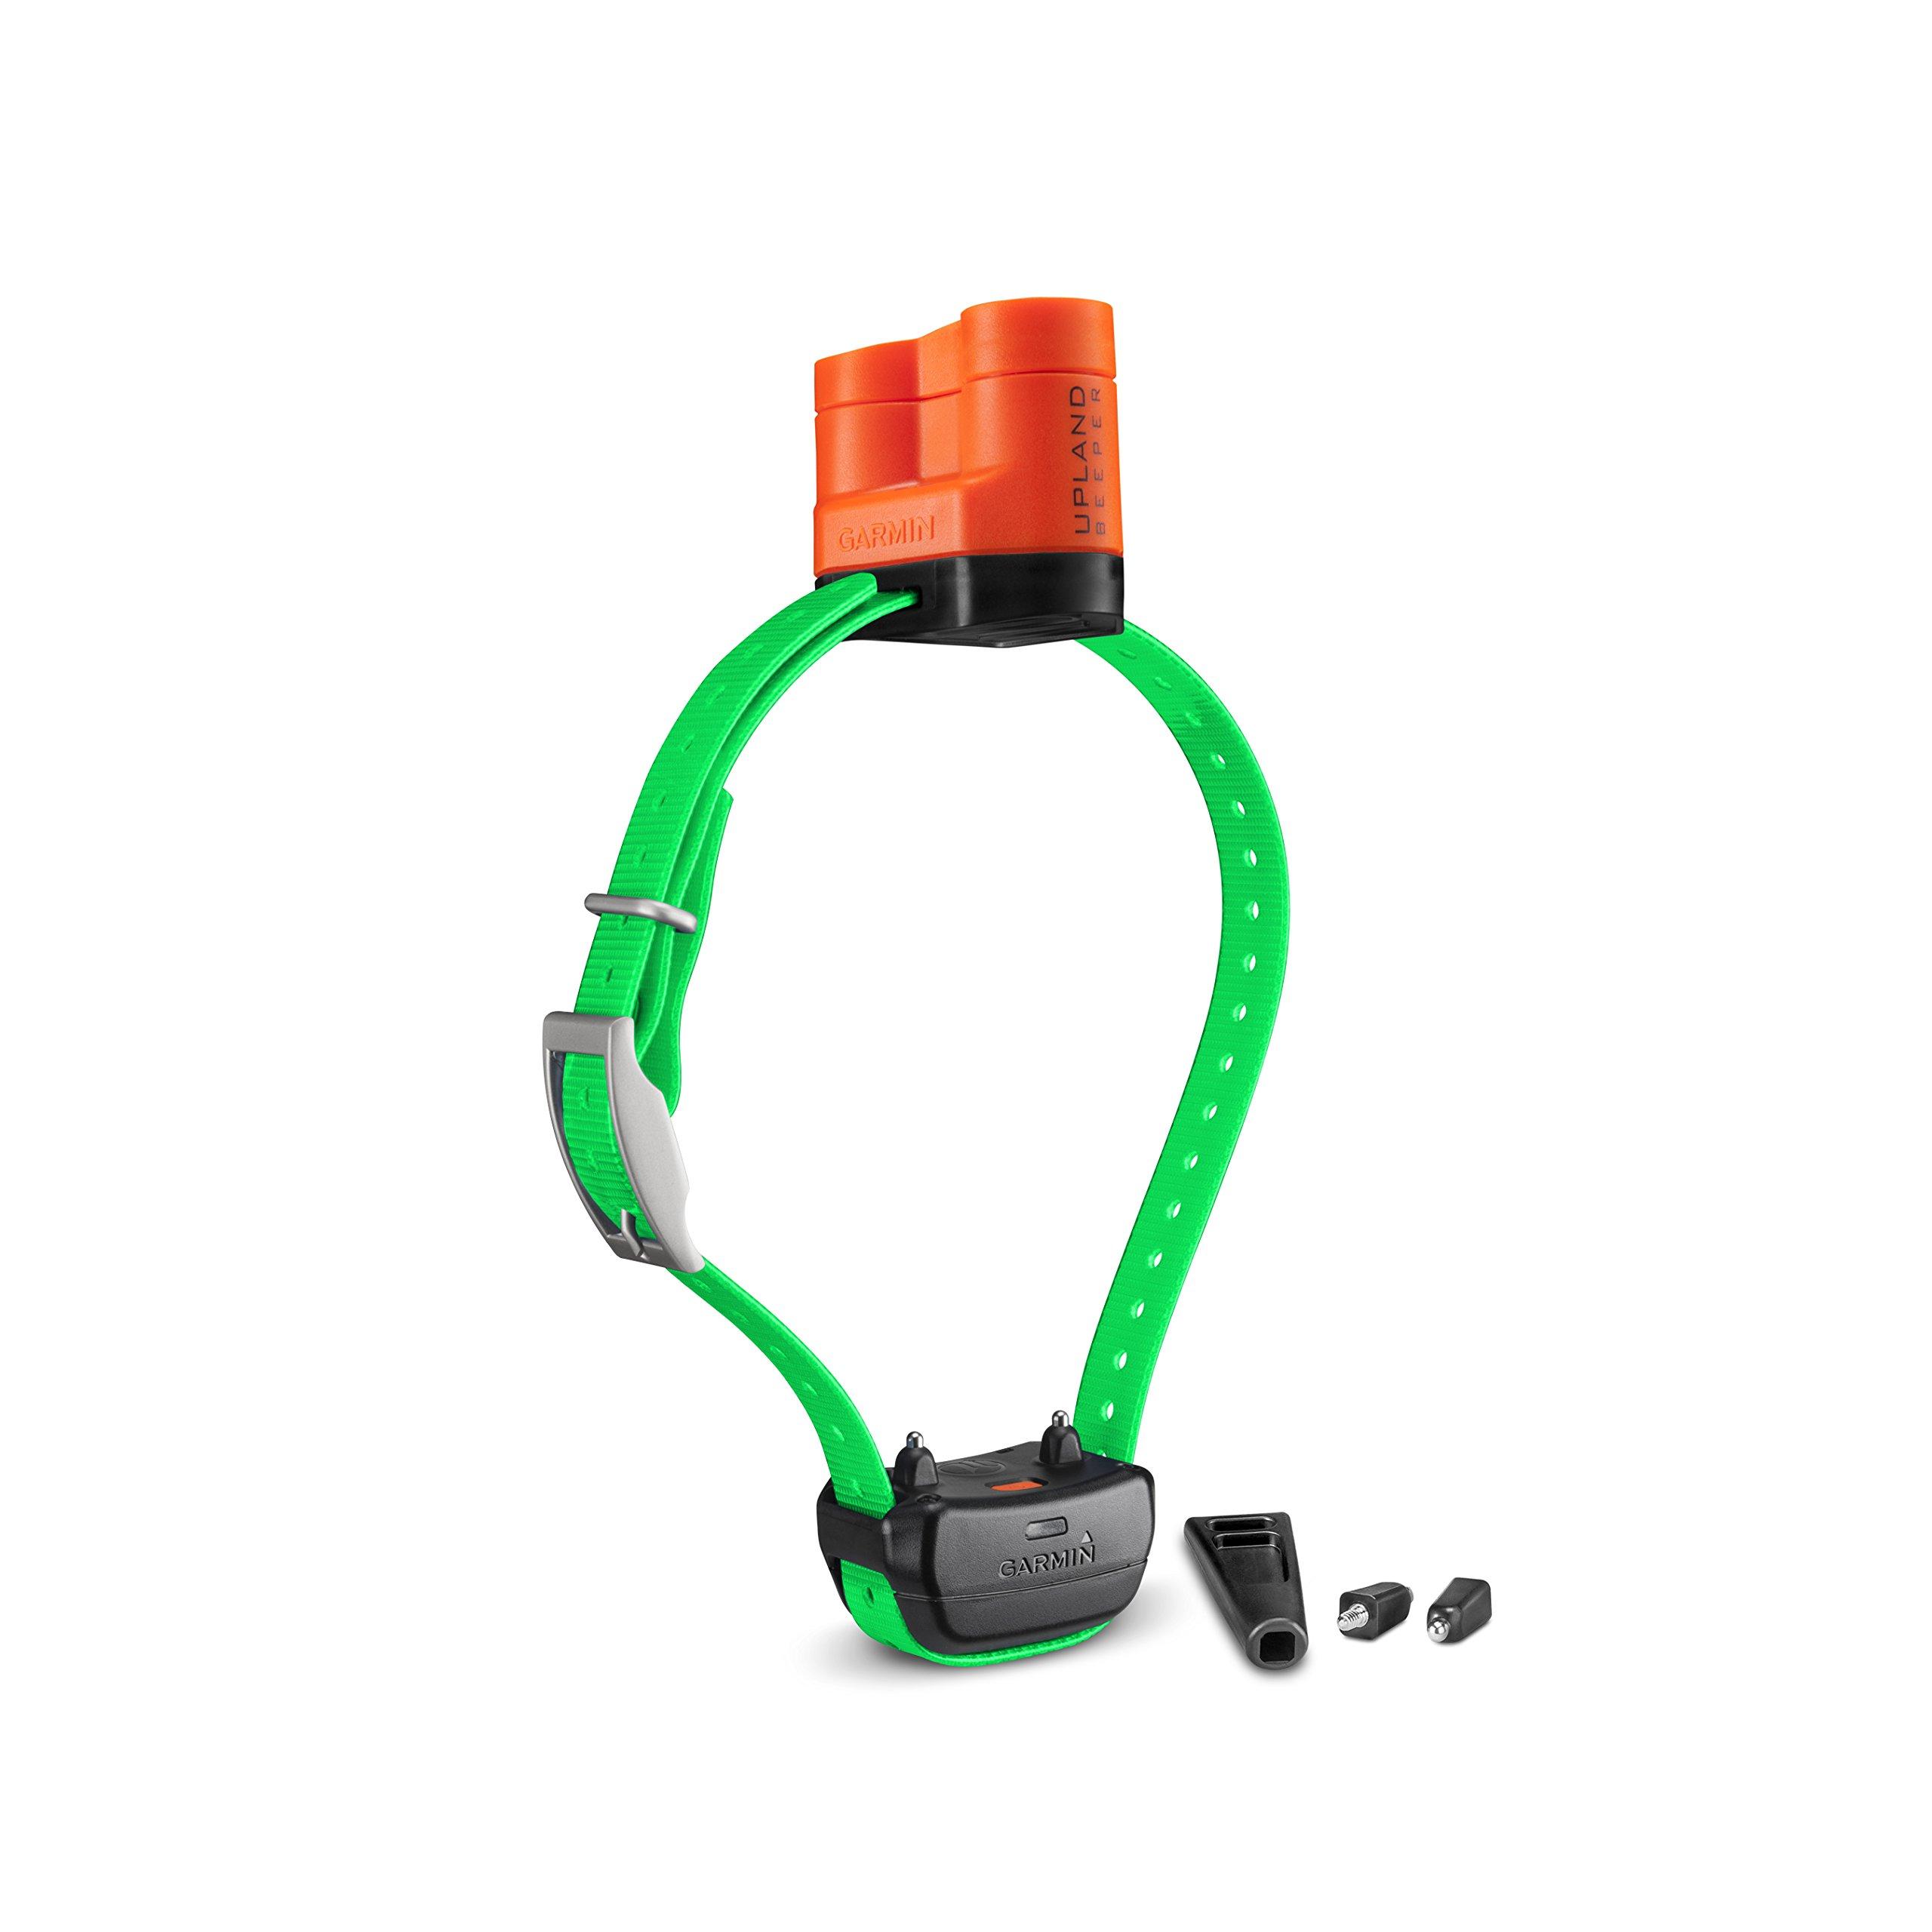 Garmin Delta Upland XC dog device only by Garmin